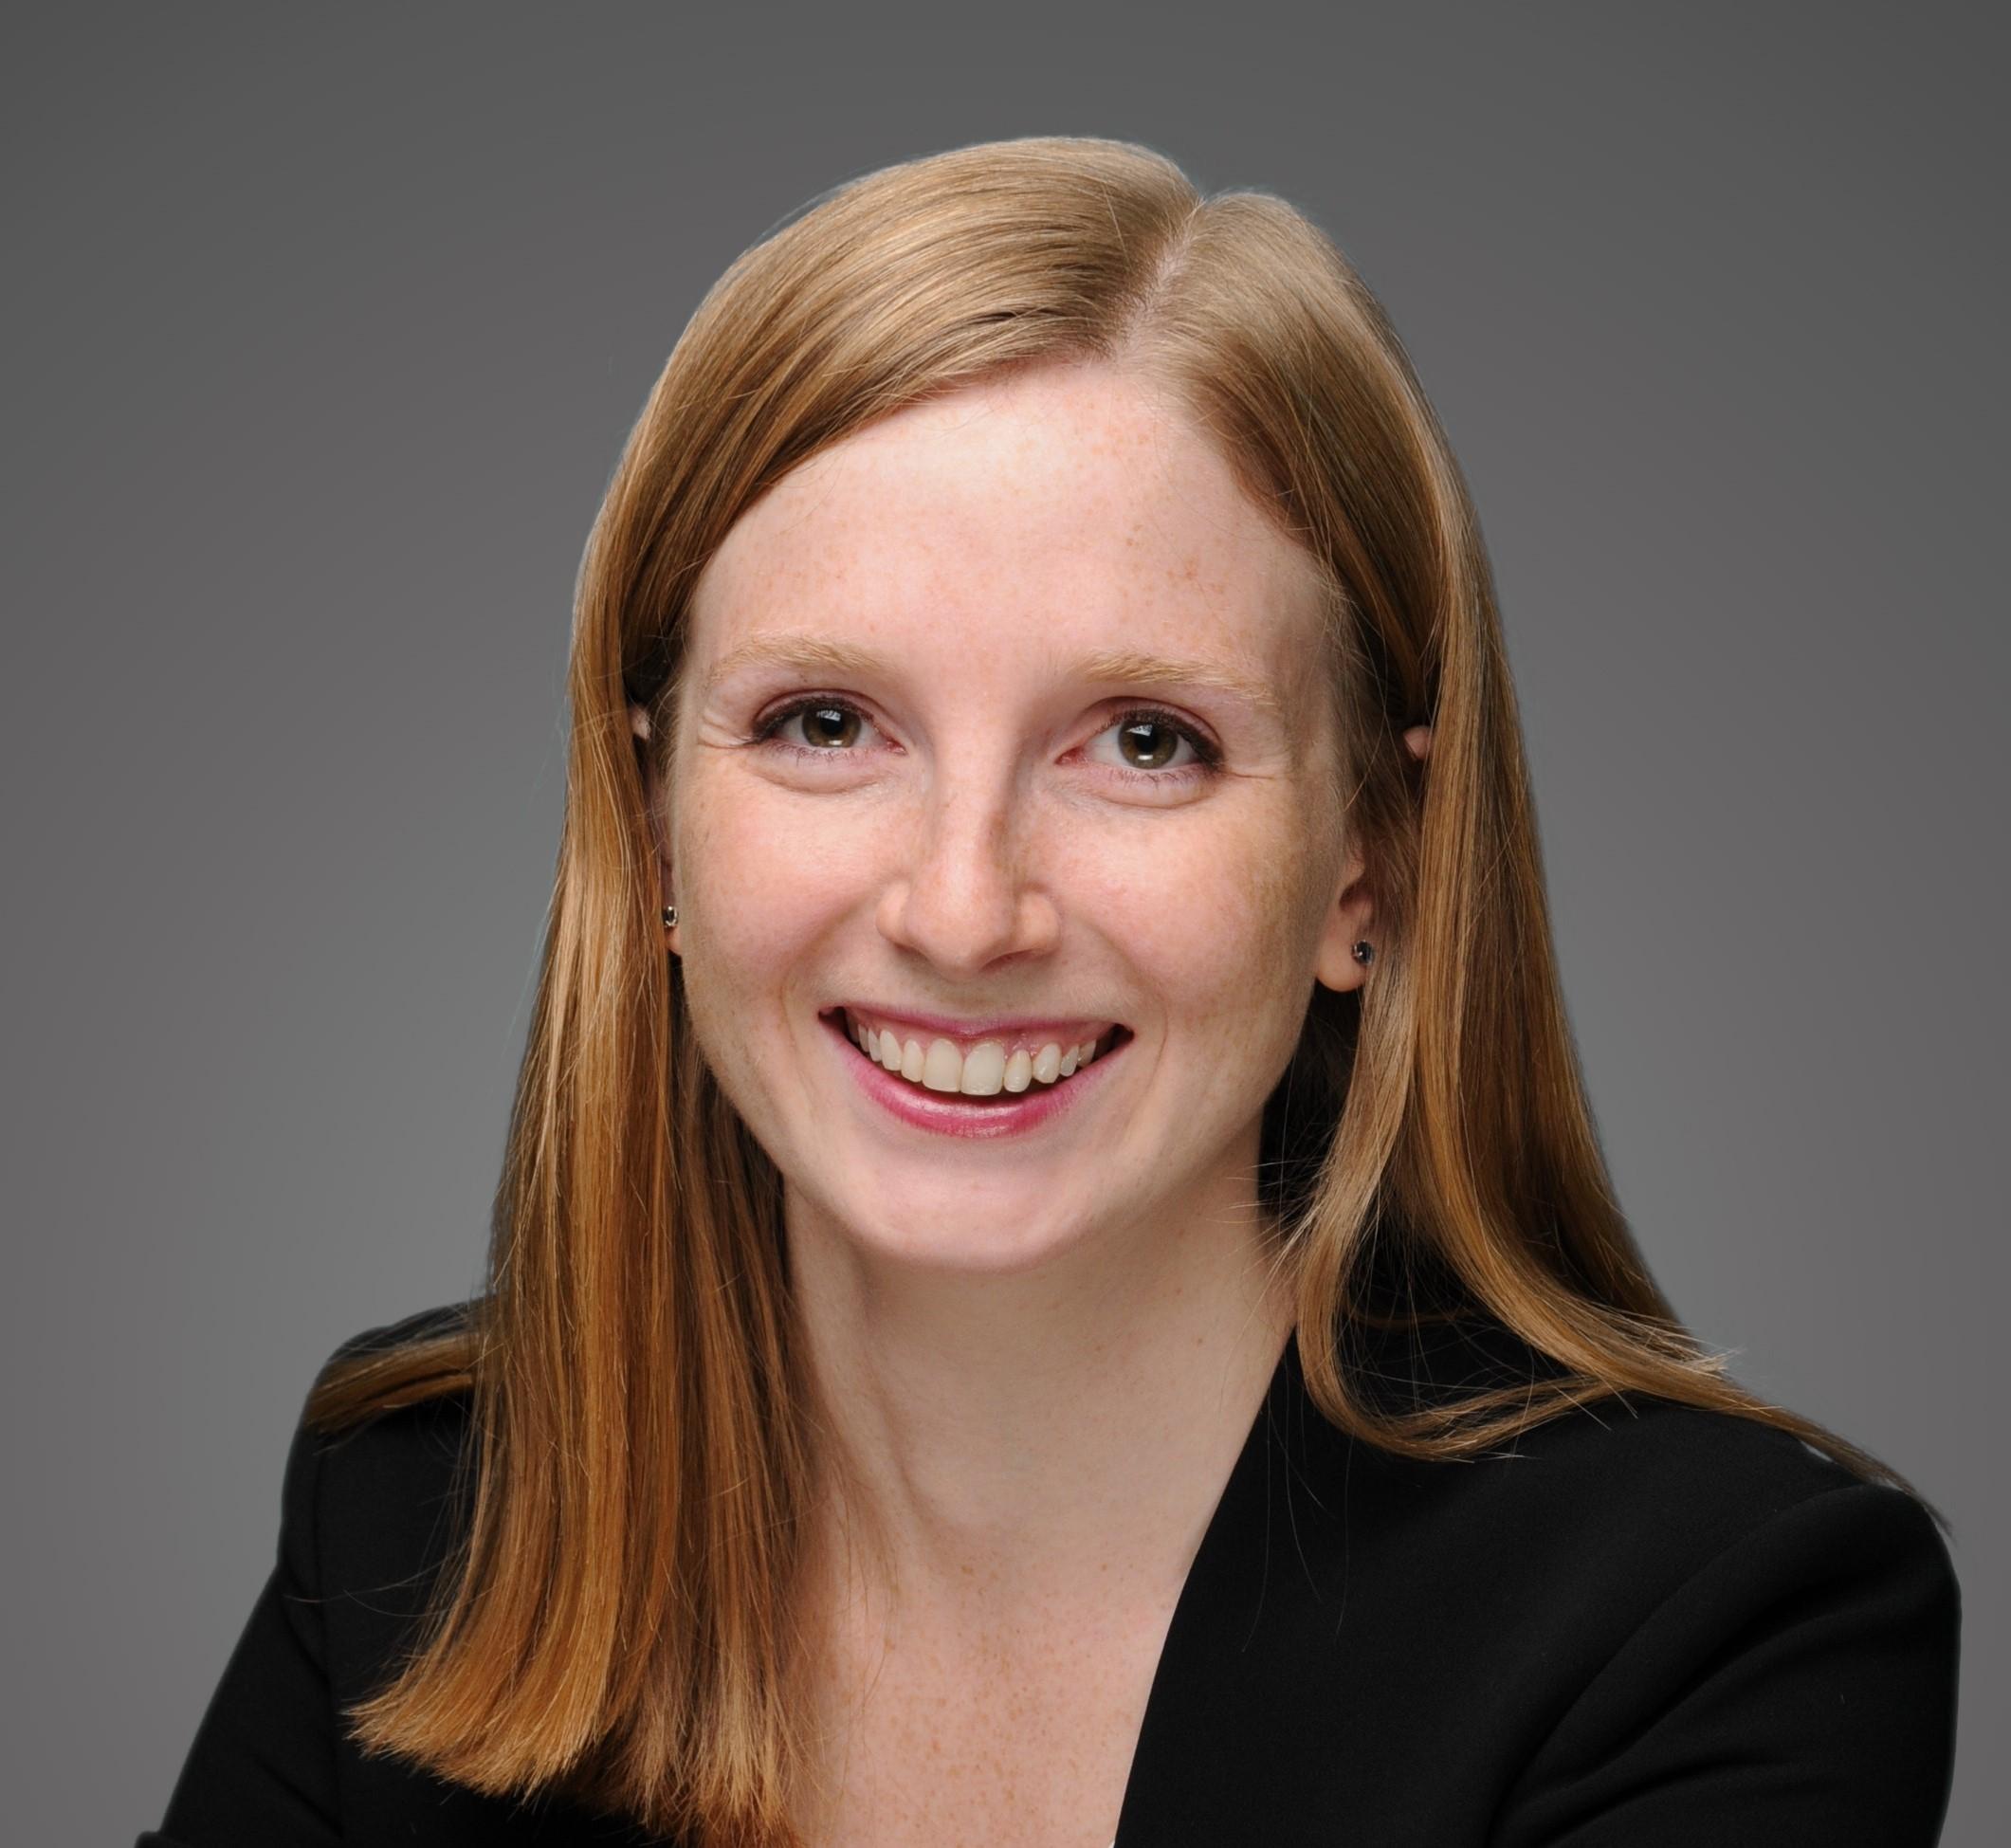 MBA_NYUStern_Alexandra_Friedman - Alexandra Friedman.jpg